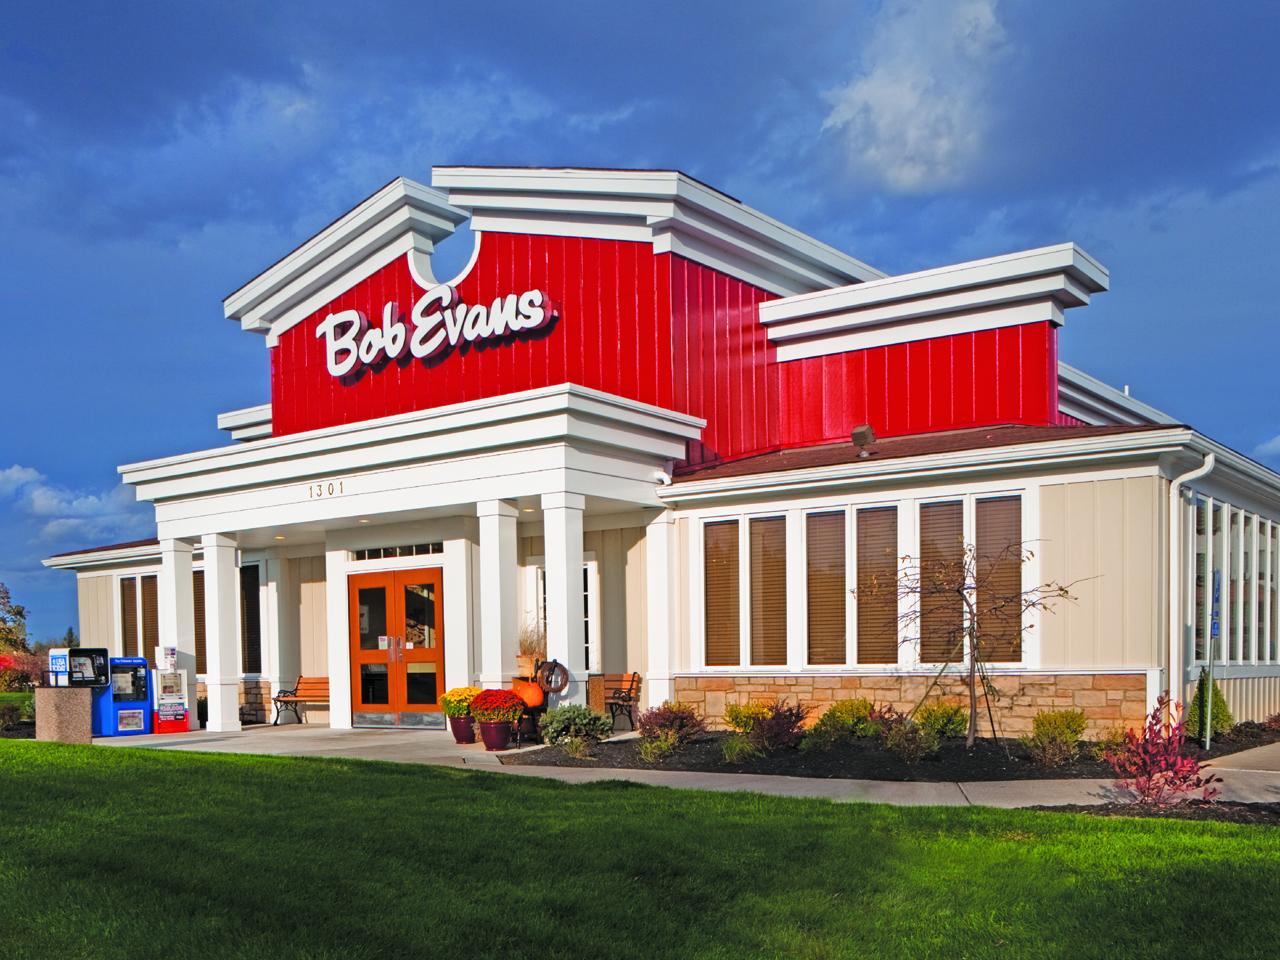 is your local bob evans restaurant closing cbs news is your local bob evans restaurant closing cbs news